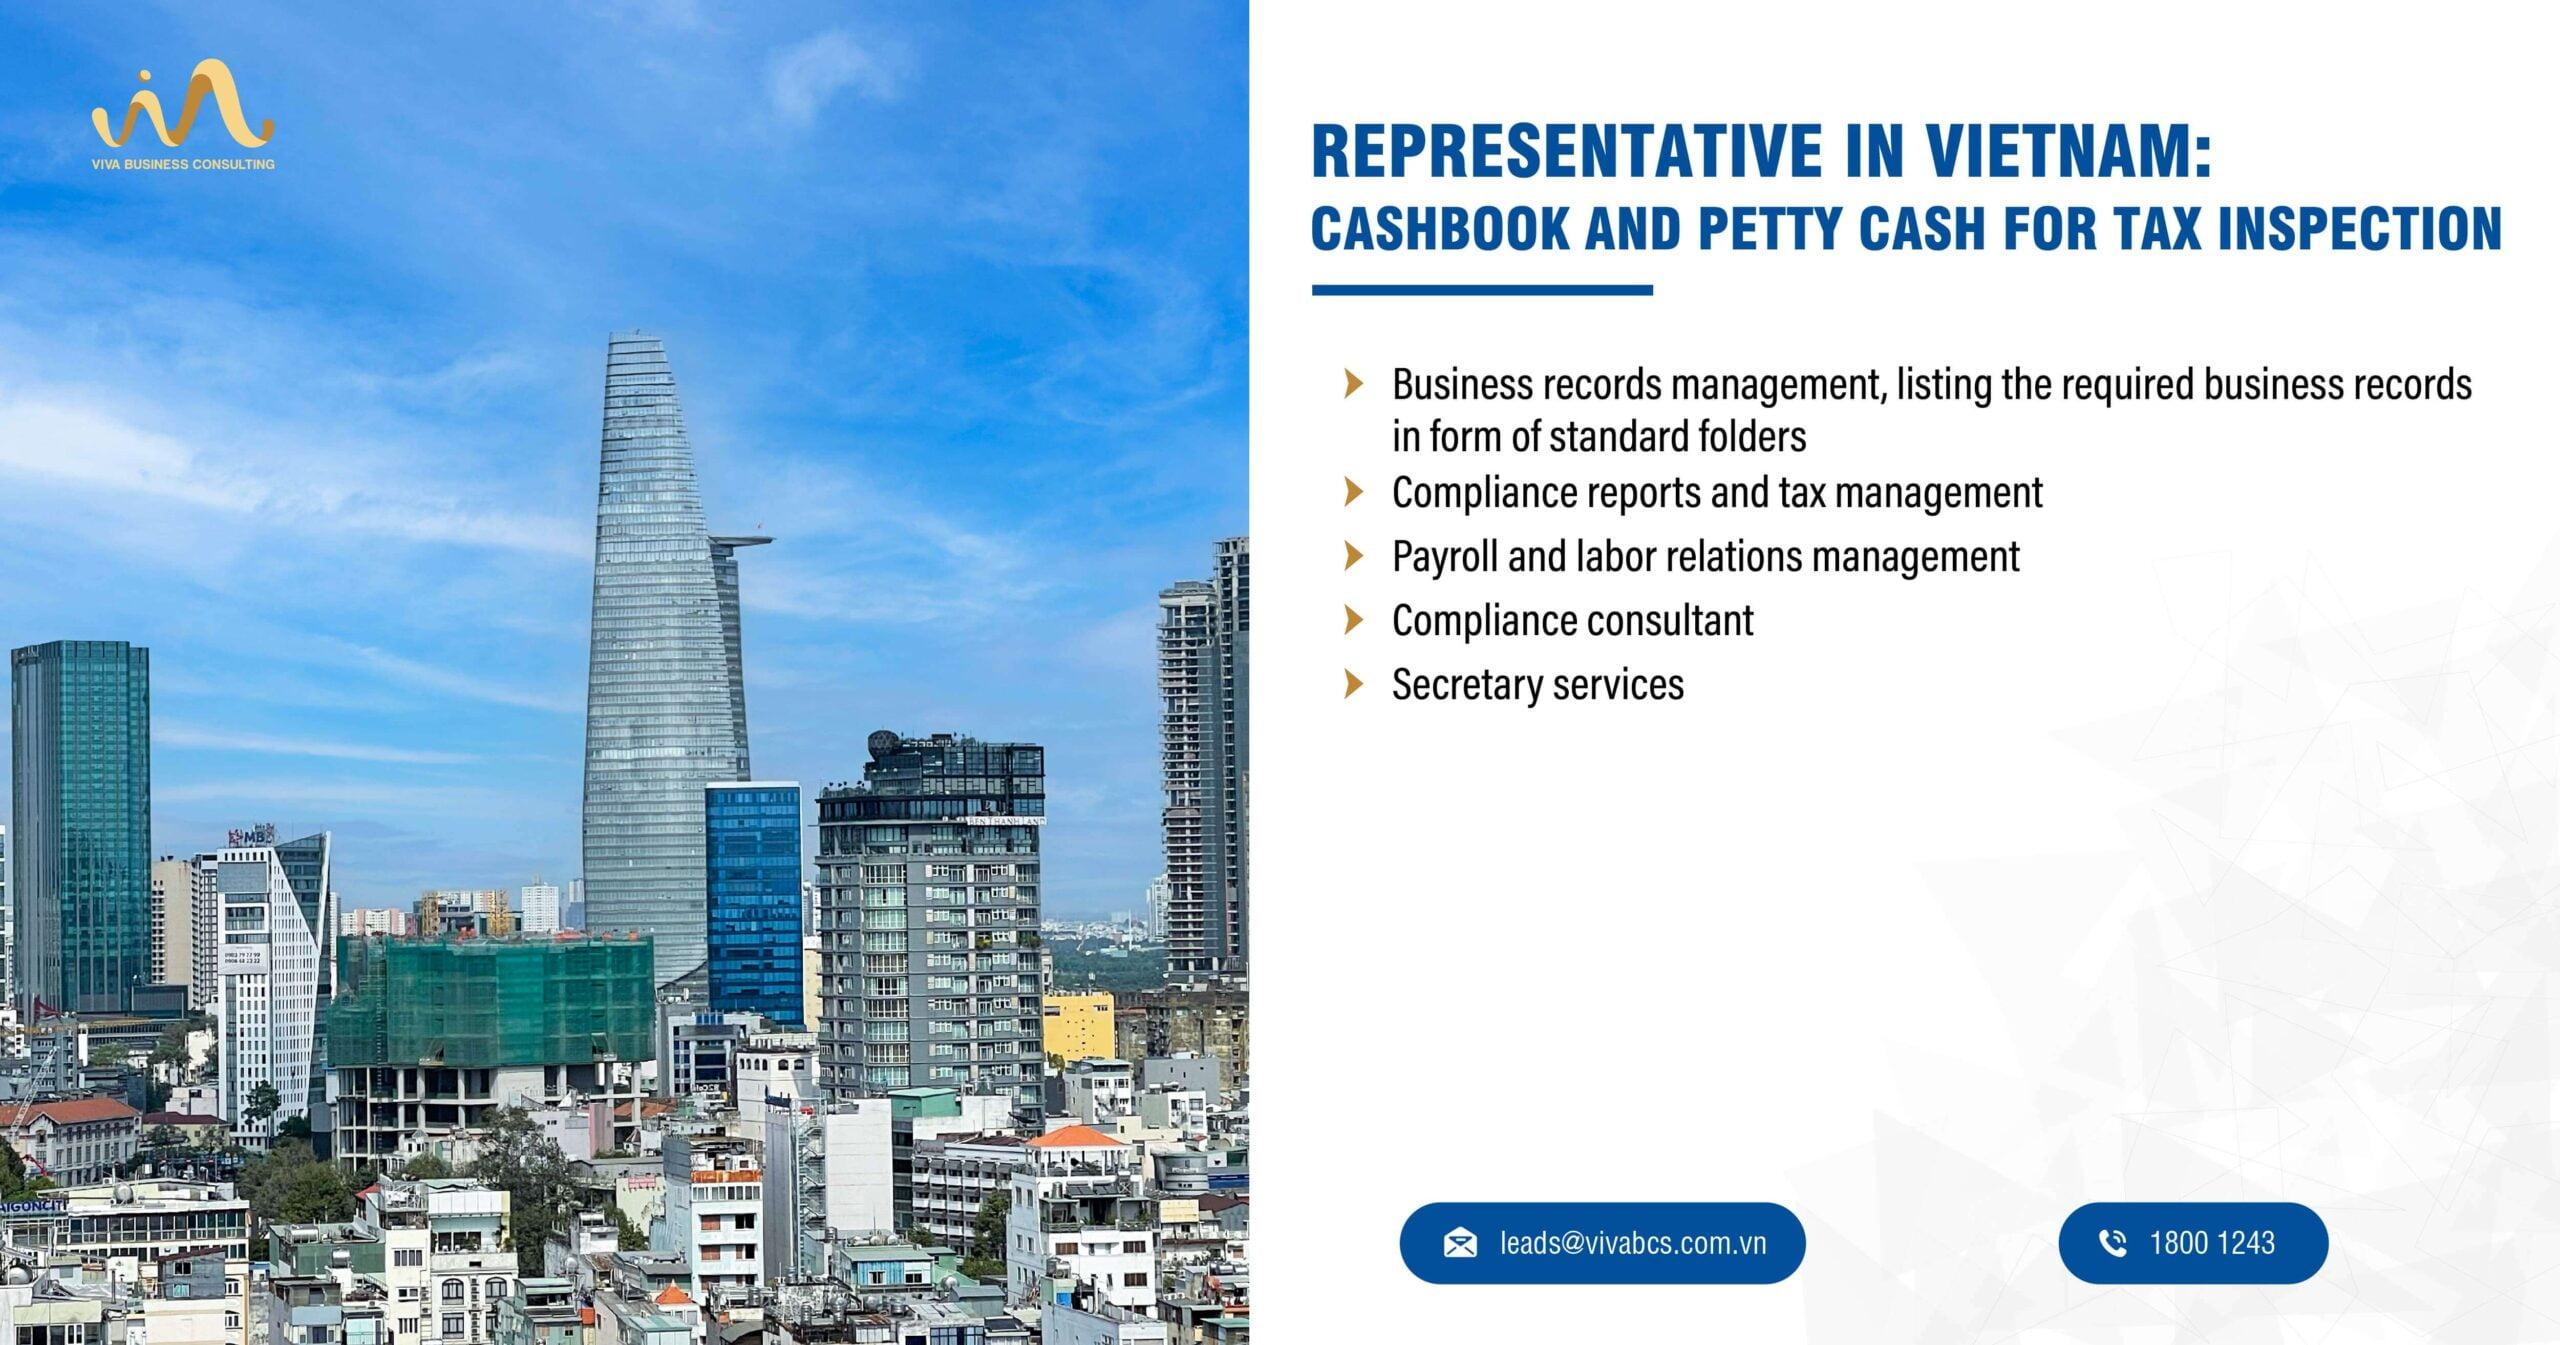 Represnetative office in Vietnam: Cashbook & Petty Cash